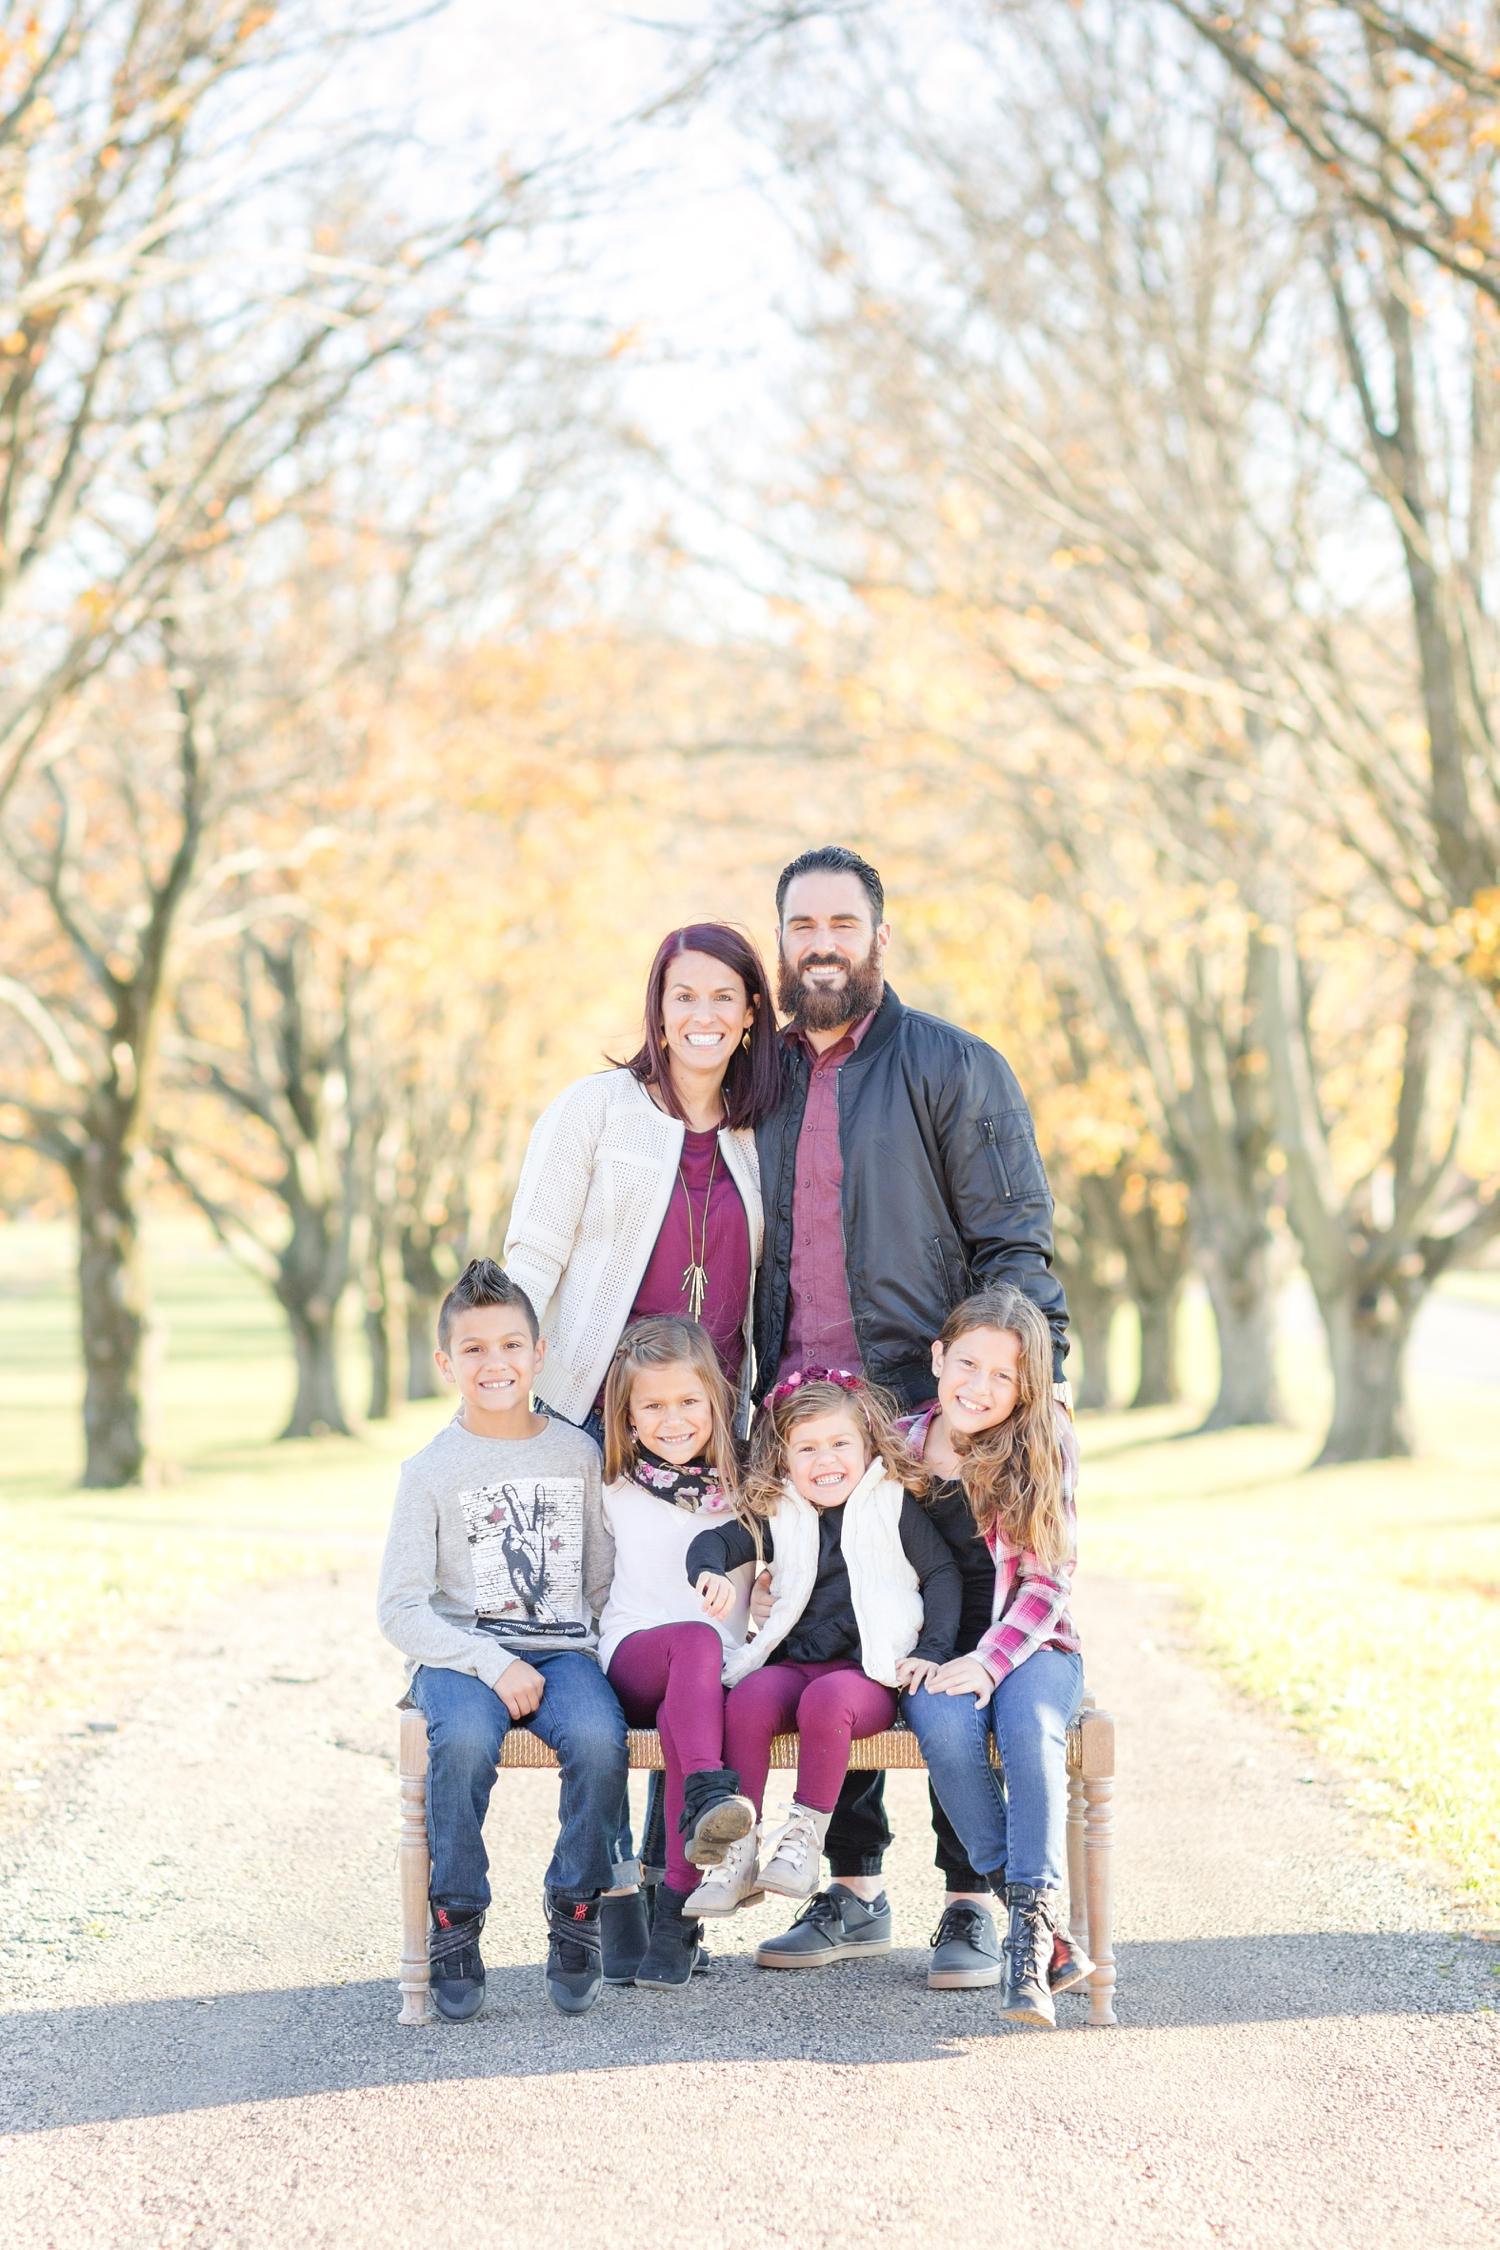 Weddle Family-115_baltimore-maryland-family-photographer-ravens-family-photos-anna-grace-photography-photo.jpg